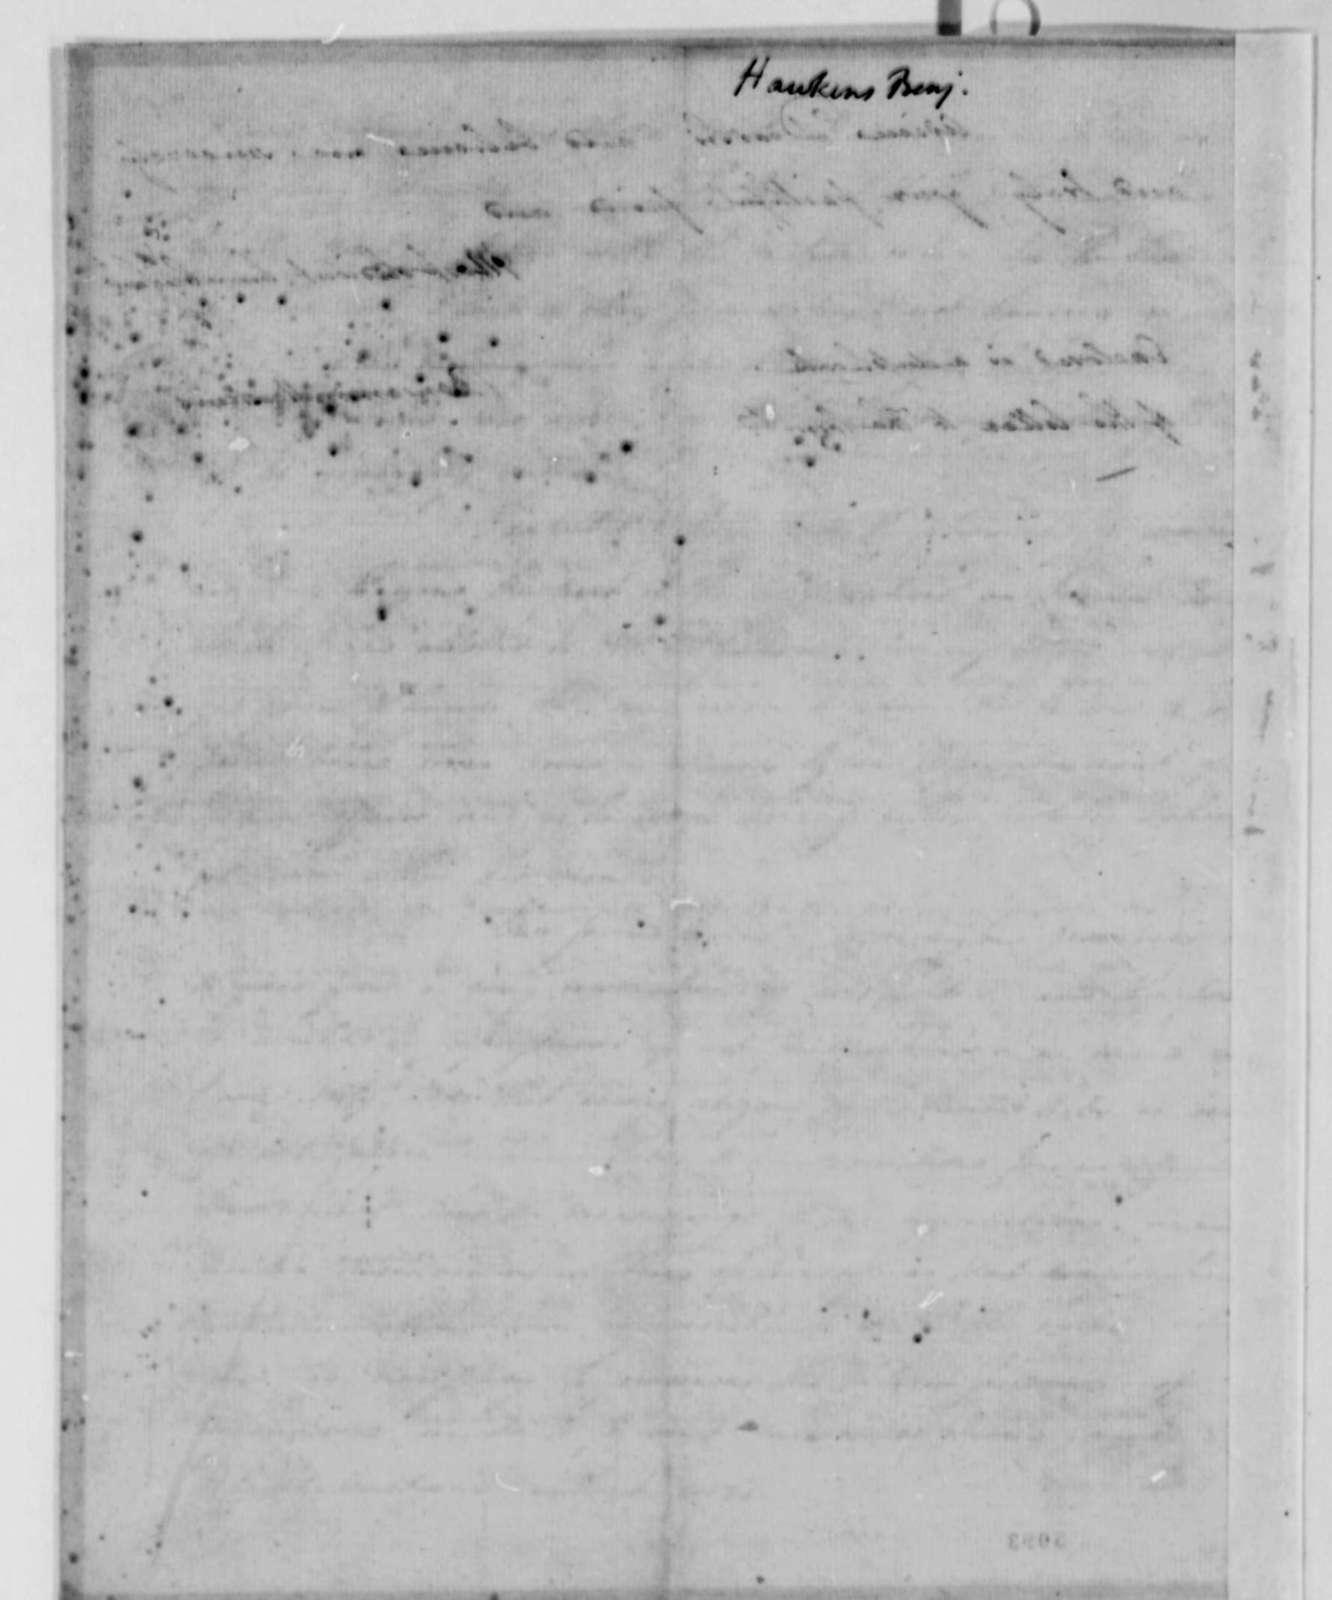 Benjamin Hawkins to Thomas Jefferson, June 9, 1787